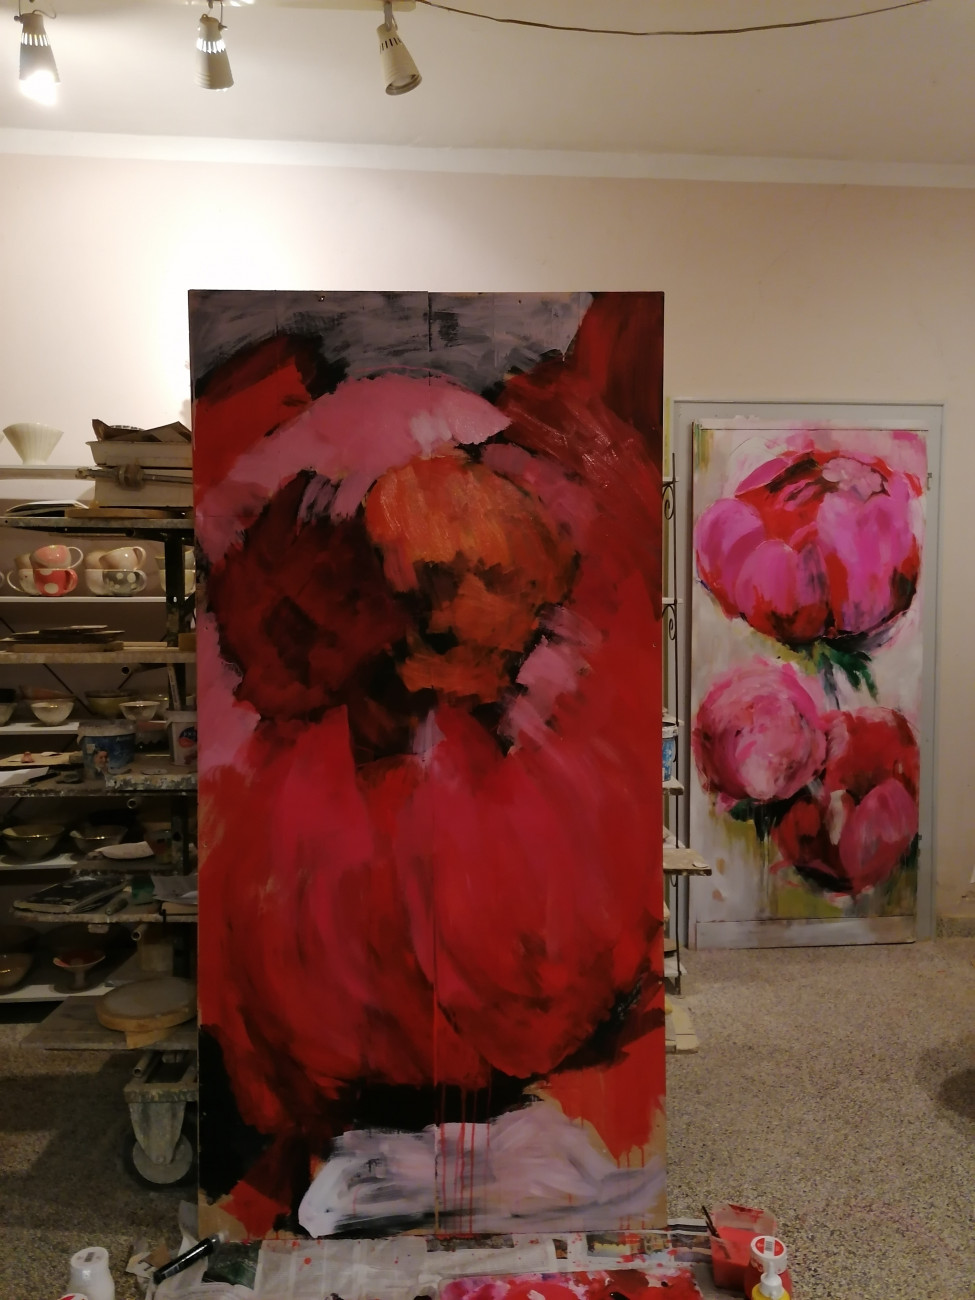 Uta Minnich, Acrylmalerei große Blumenbilder